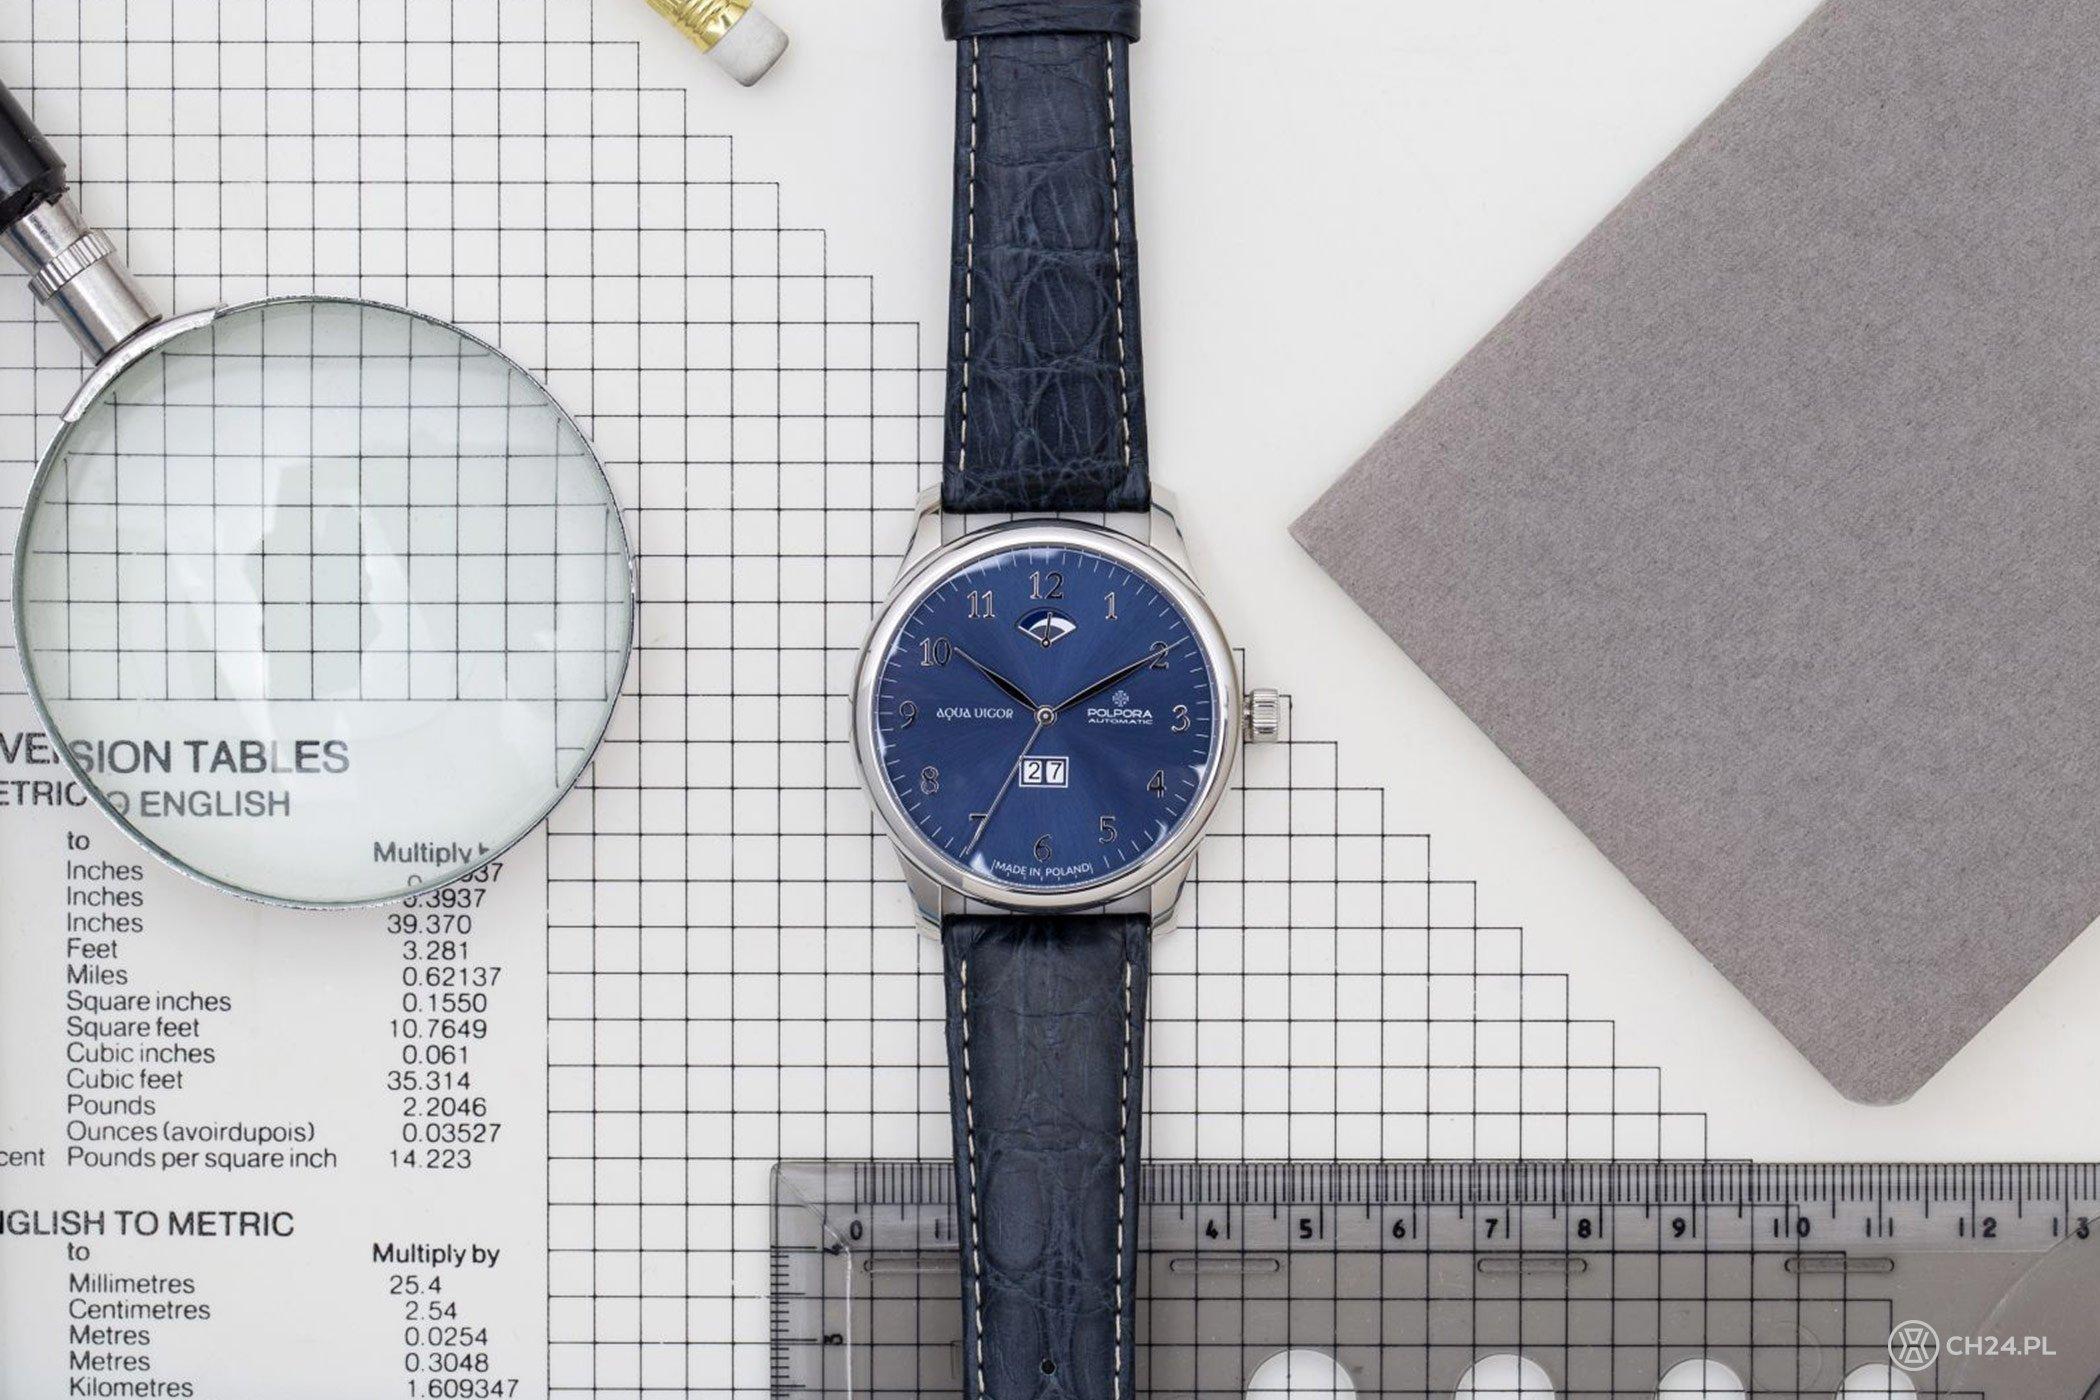 b0dded2c90df1a Polpora - premiera zegarków 1918, Aqua Vigor i Globtroter [cena ...